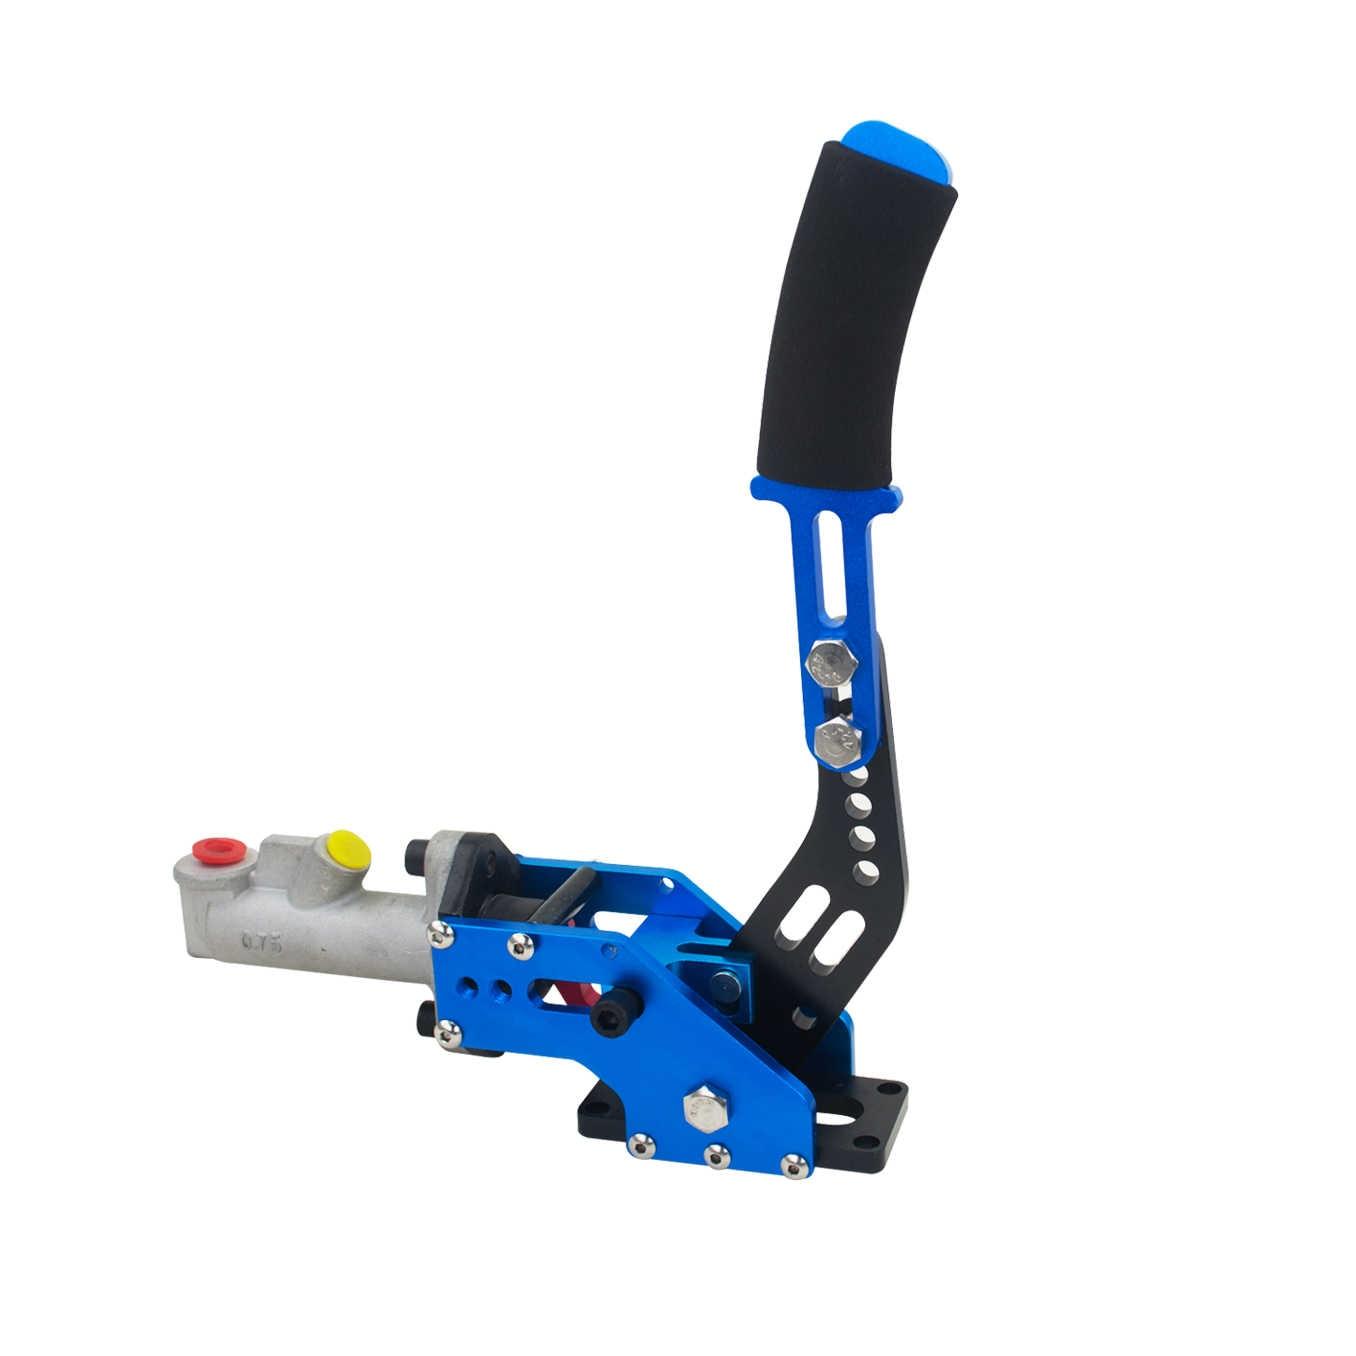 LZONE - Racing Aluminum Universal Hydraulic Handbrake Lever Drift Hand  brake E-Brake Racing NEW JR3654